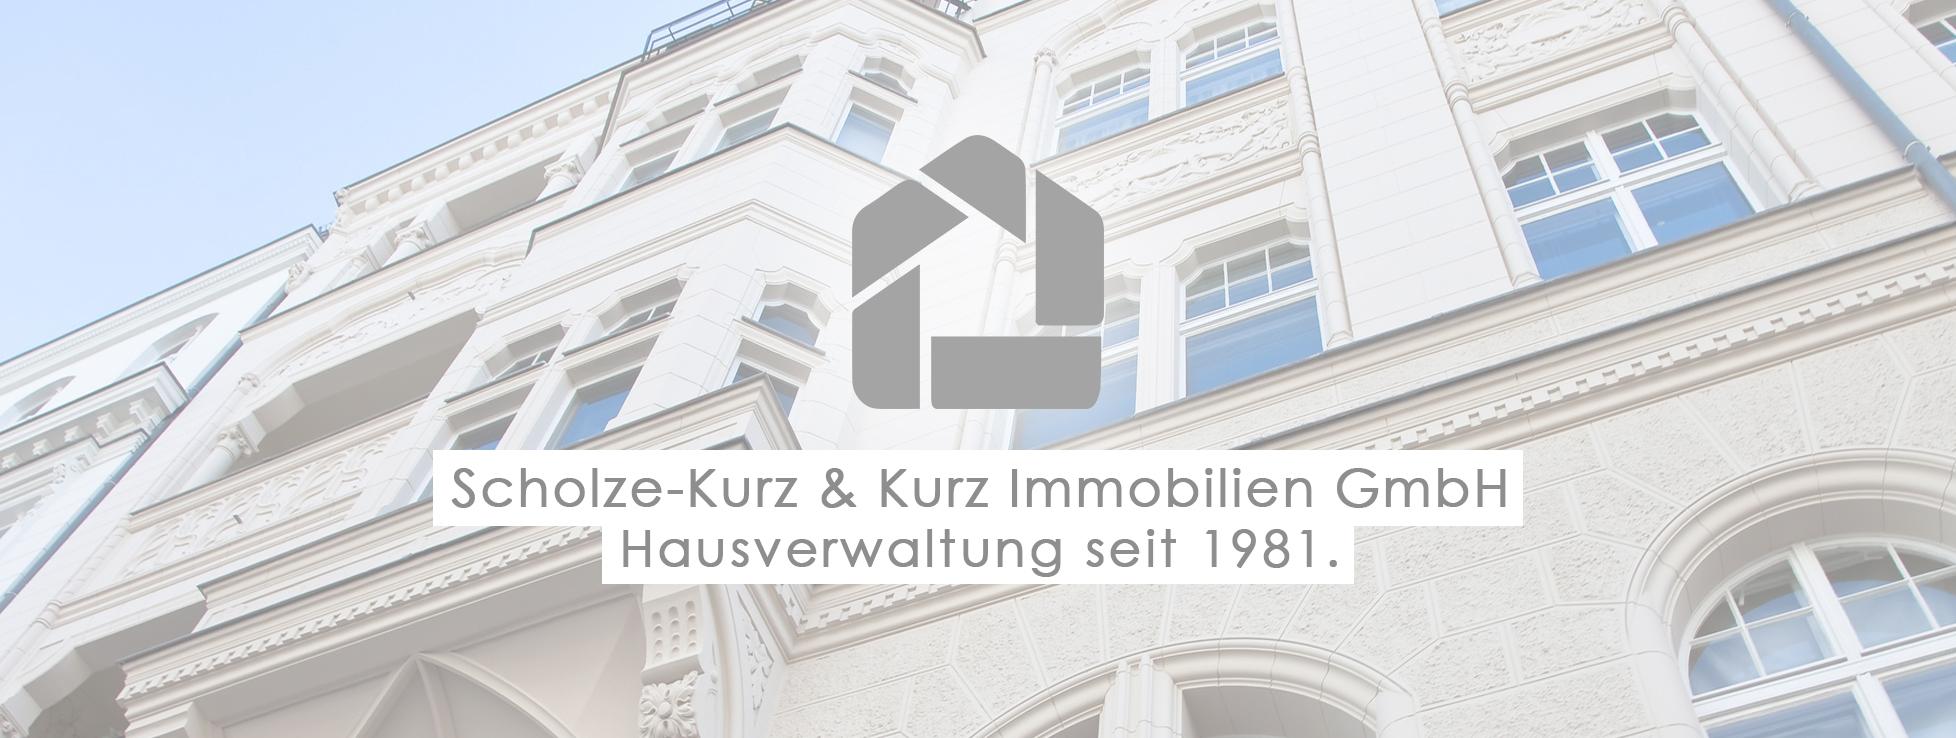 Hausverwaltung Kelkheim, Scholze-Kurz & Kurz Immobilien GmbH